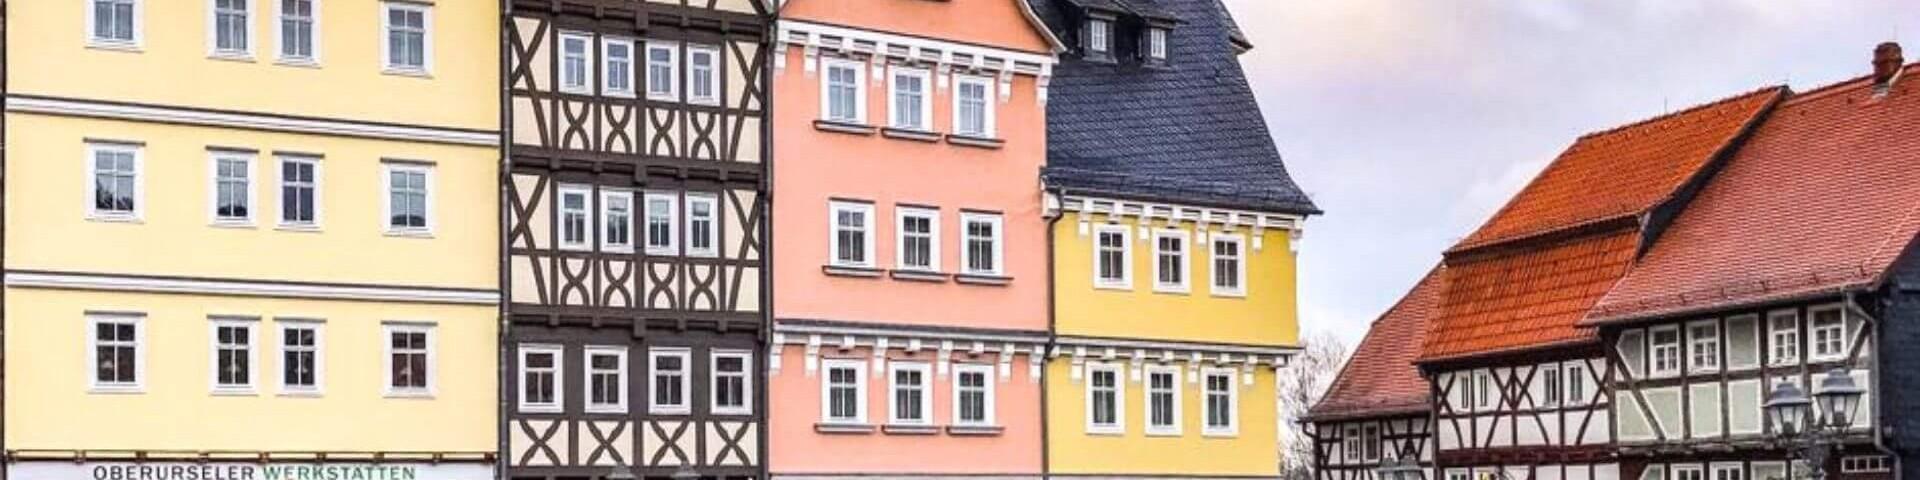 Day trips from Frankfurt am Main